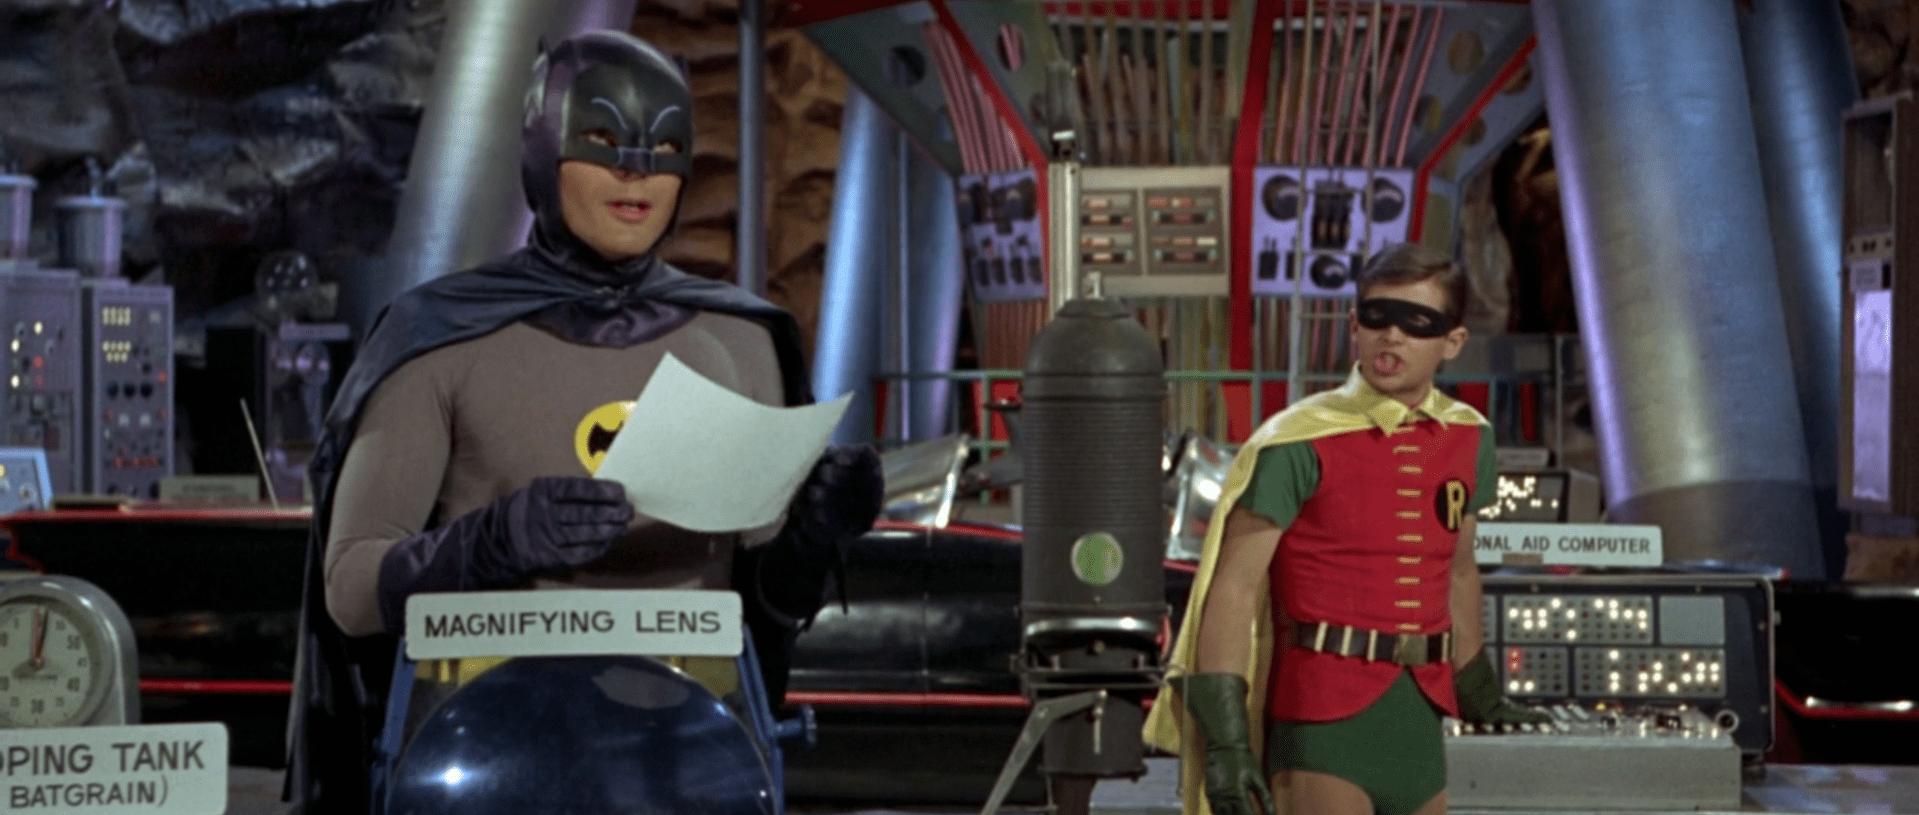 batman 1966 Tim Burton Review My Geek Actu.png